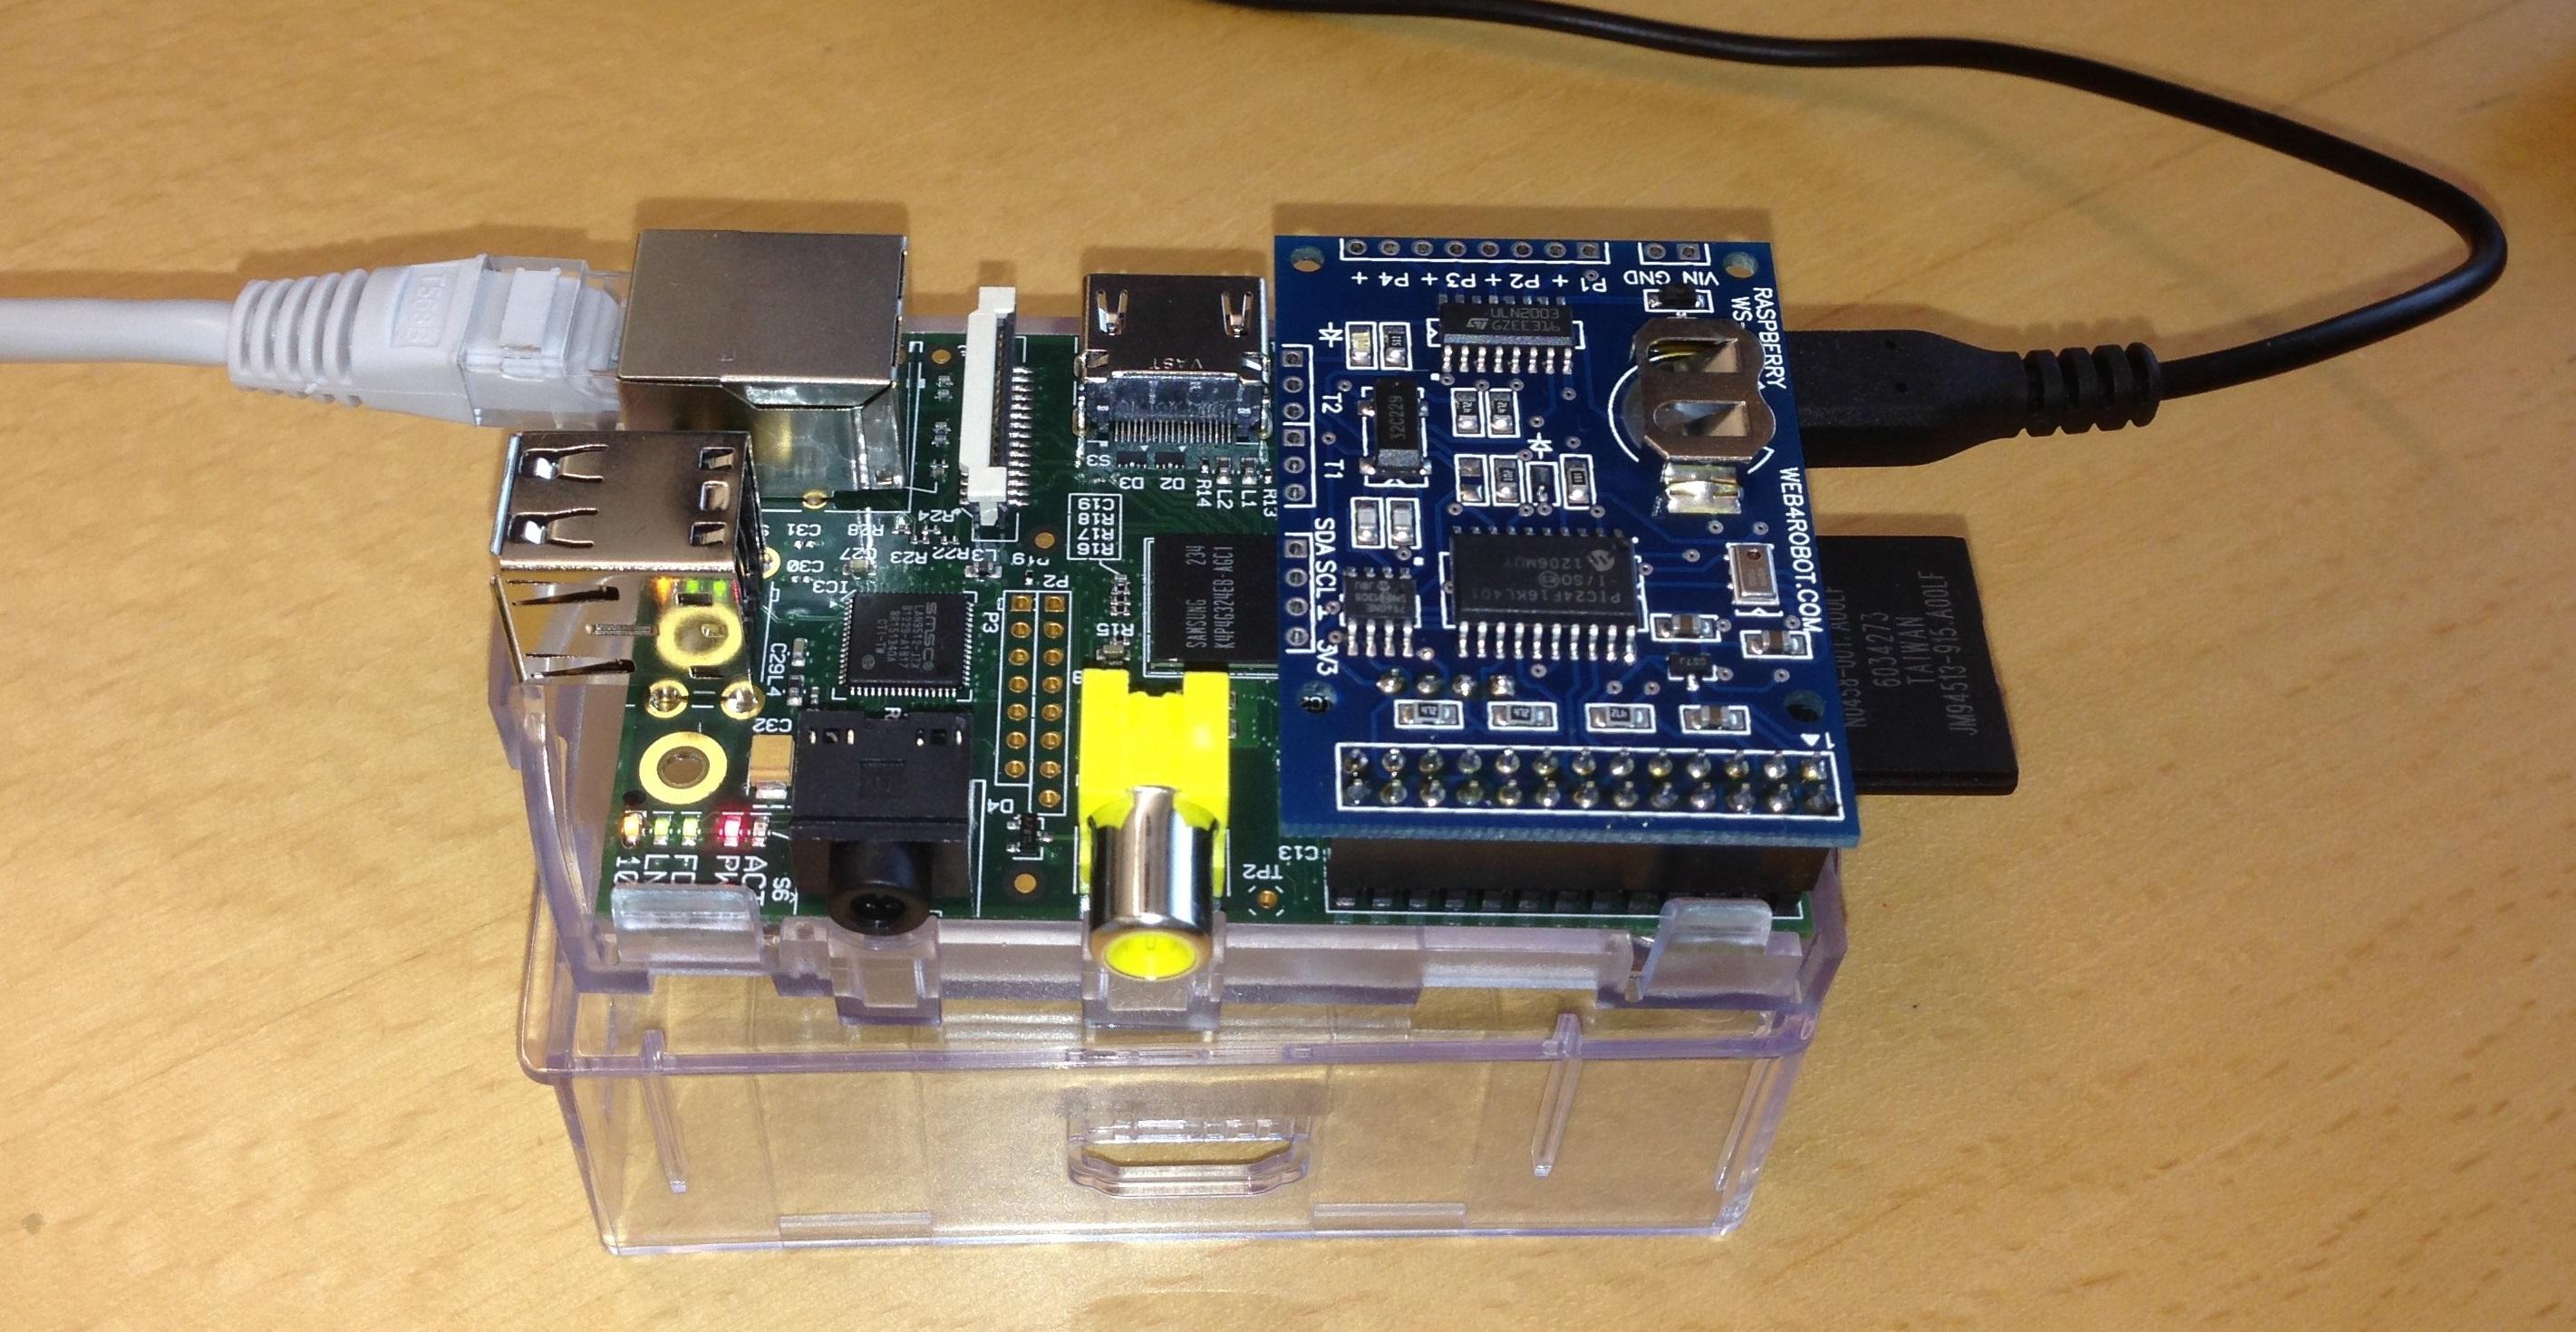 Raspberry Pi + Java SDK based OPC UA weather station